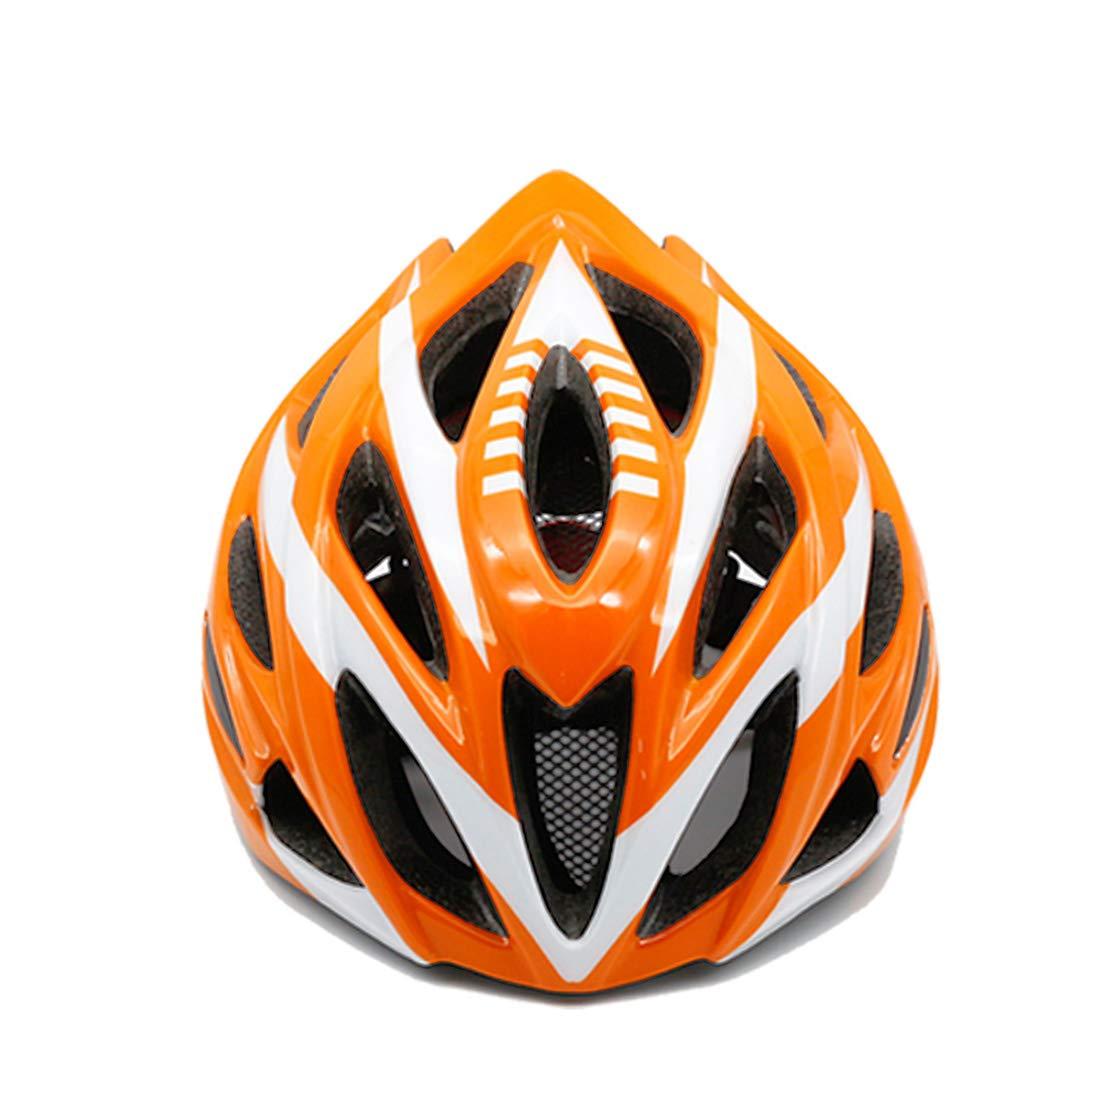 CAFUTY 大人用自転車ヘルメット自転車乗馬ヘルメット自転車安全ヘルメット屋外用サイクリング愛好家に適して (Color : オレンジ)   B07PLCWF7F